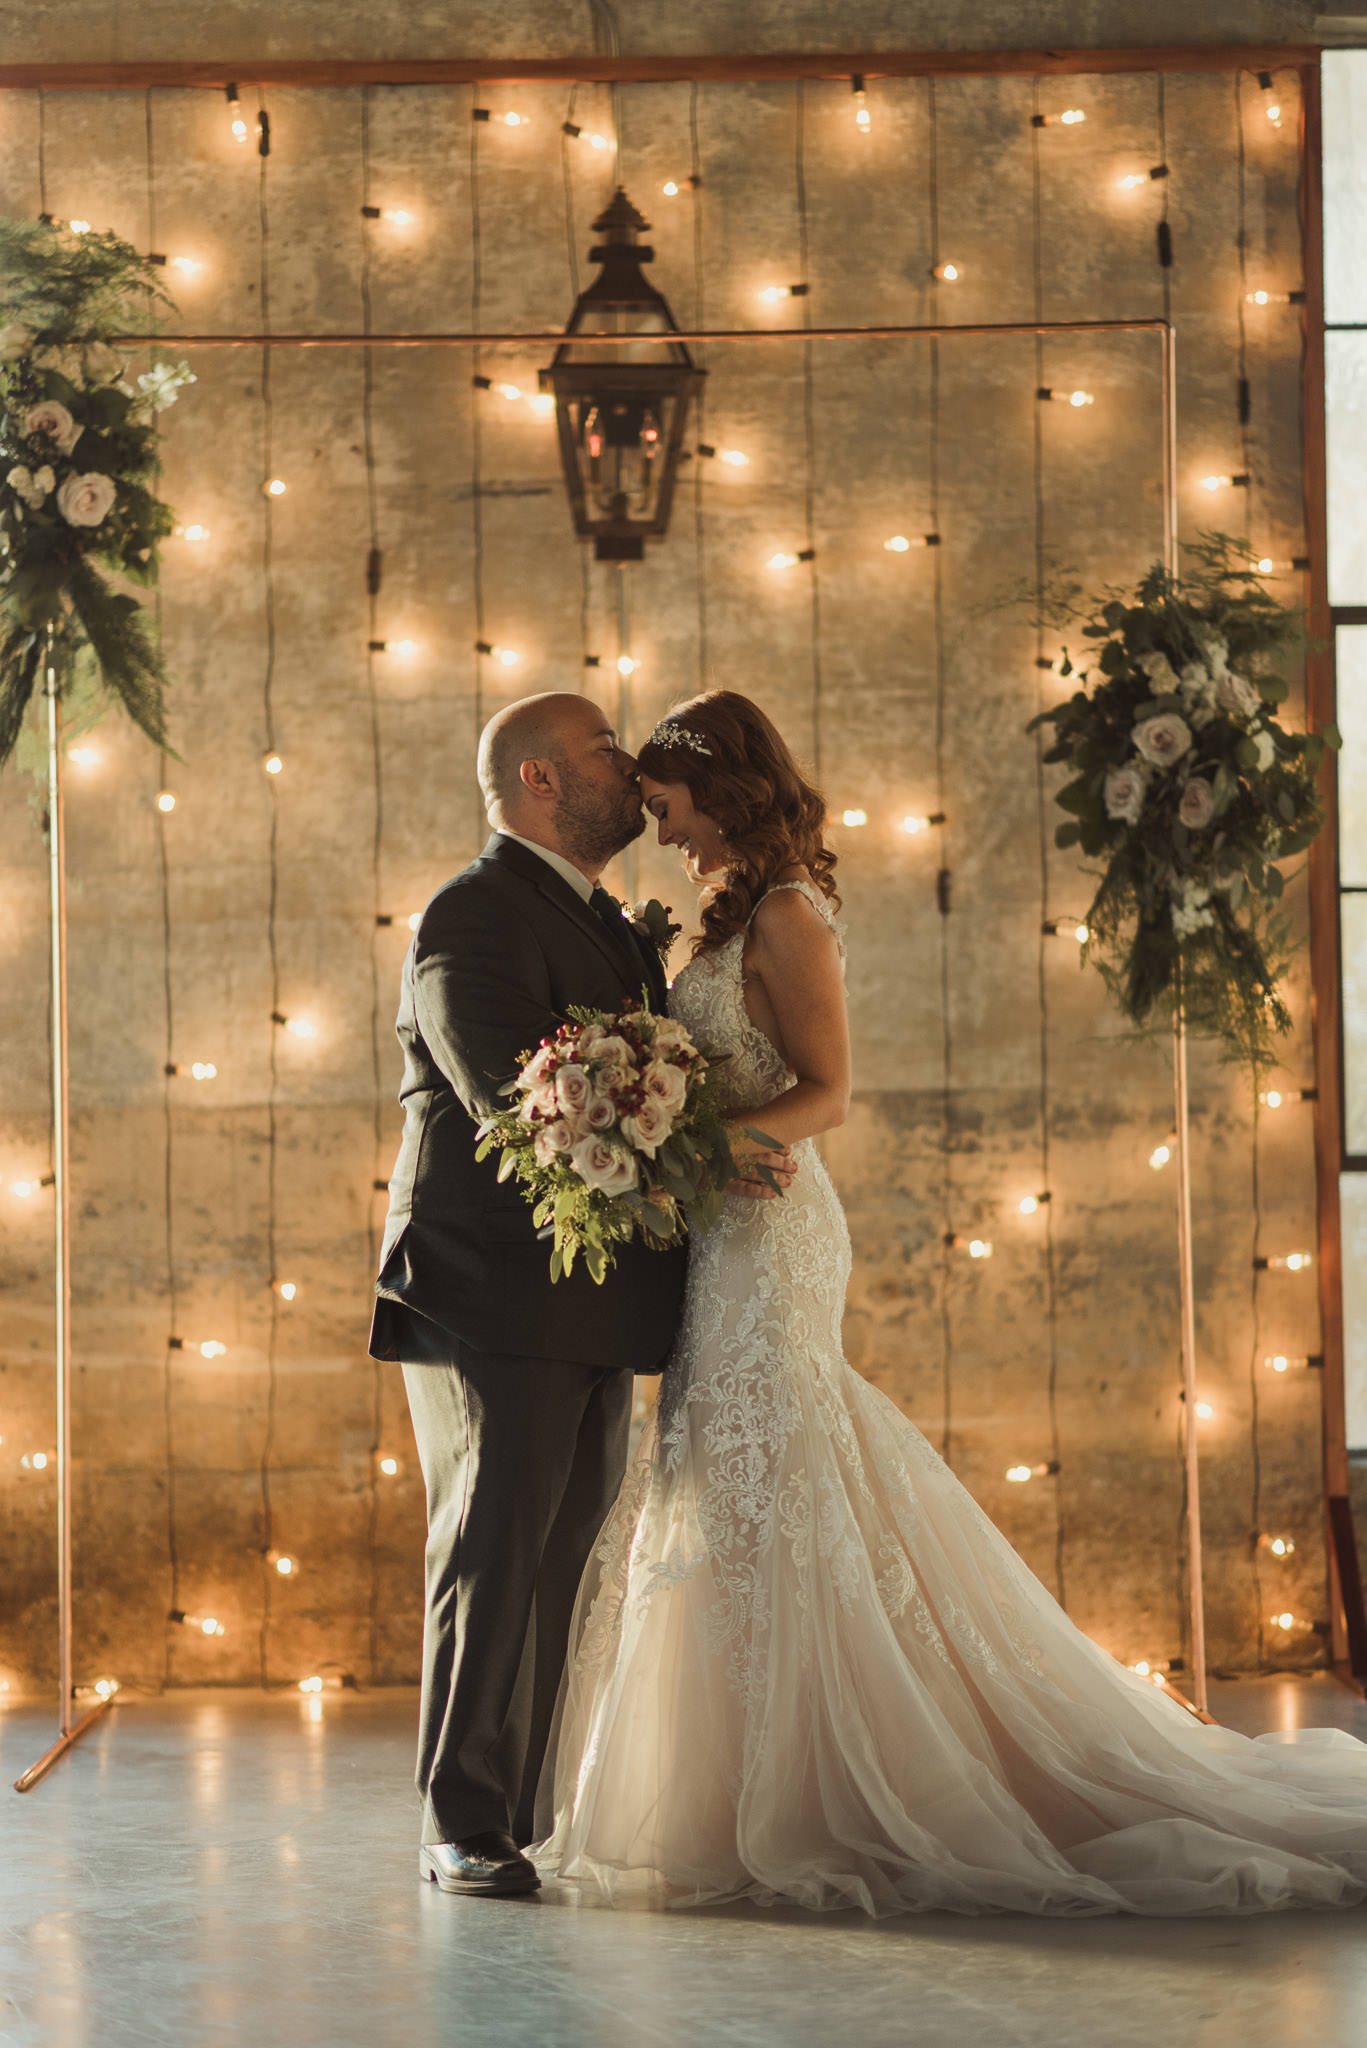 Cynthia-Curtis-Olde-Dobbine-Station-Houston-Wedding-Photographer-sm-59.jpg